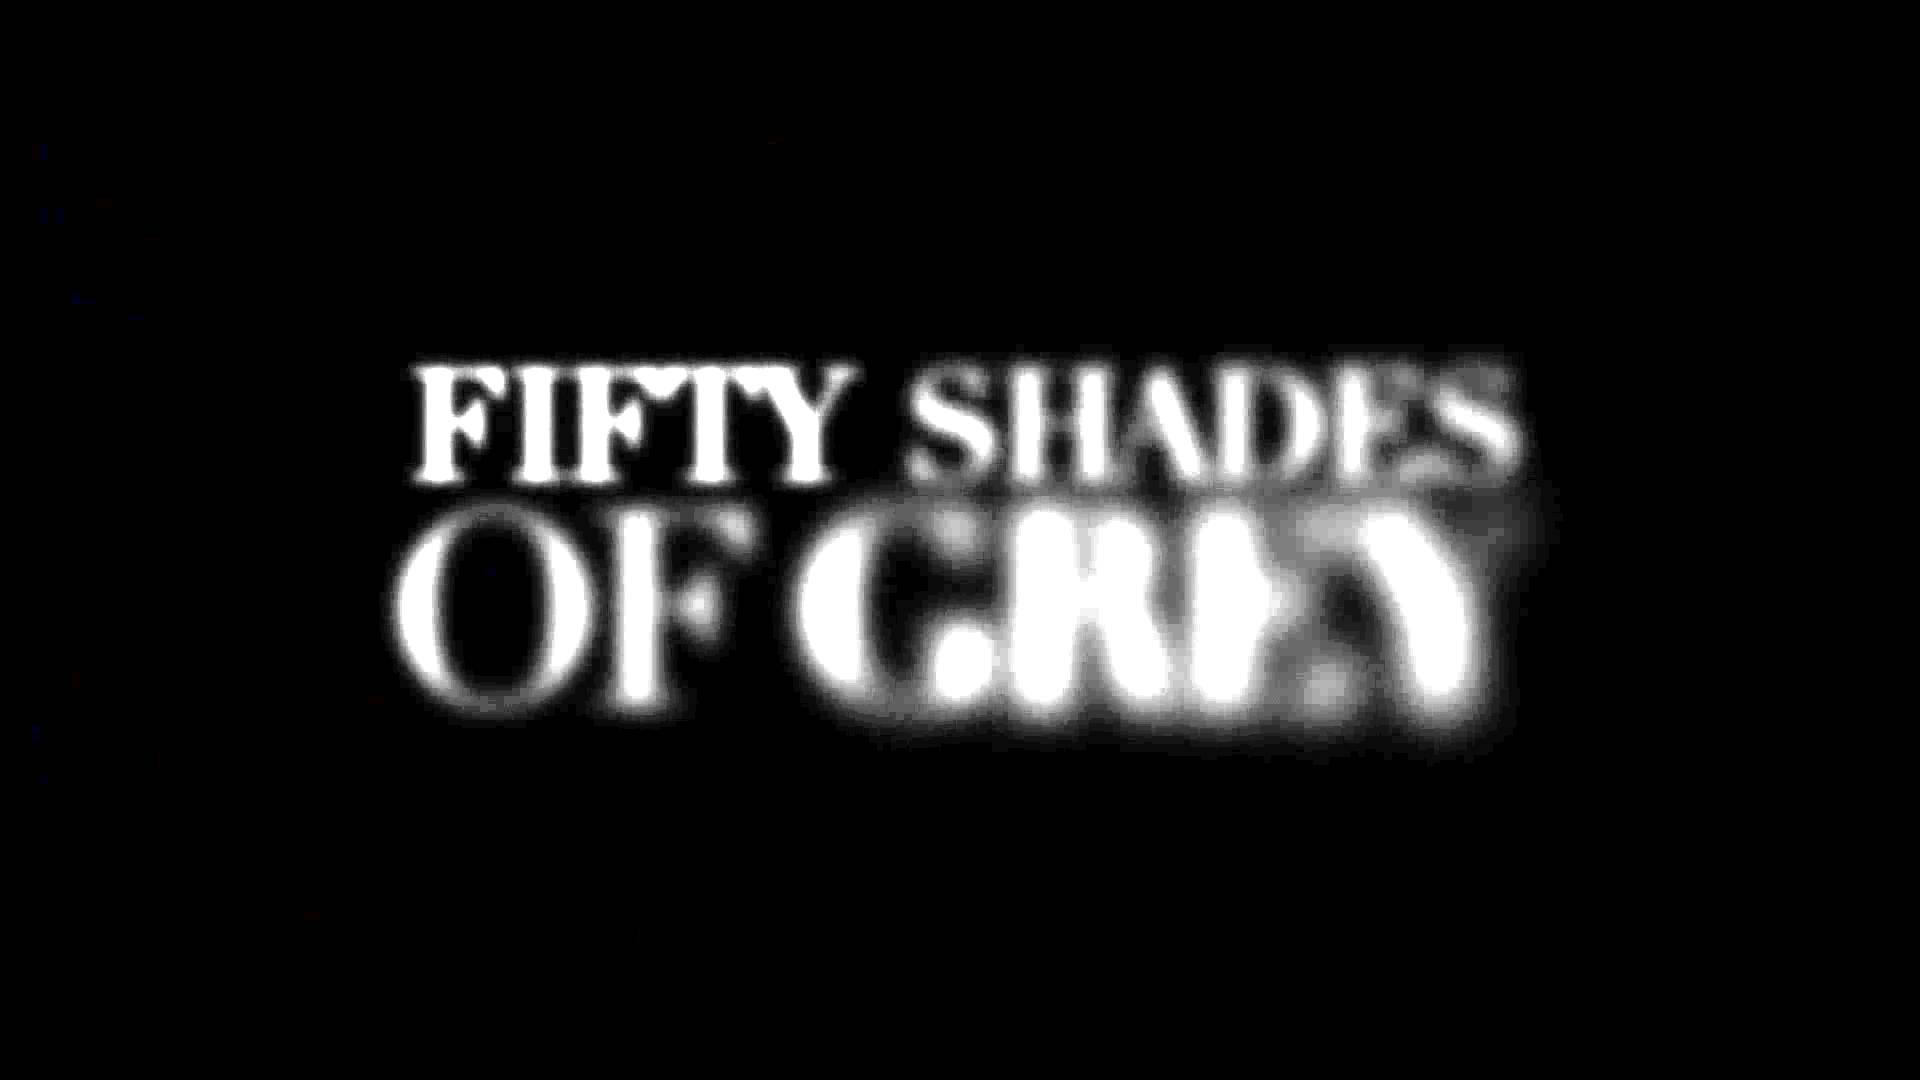 Fifty Shades Of Grey Wallpaper 9